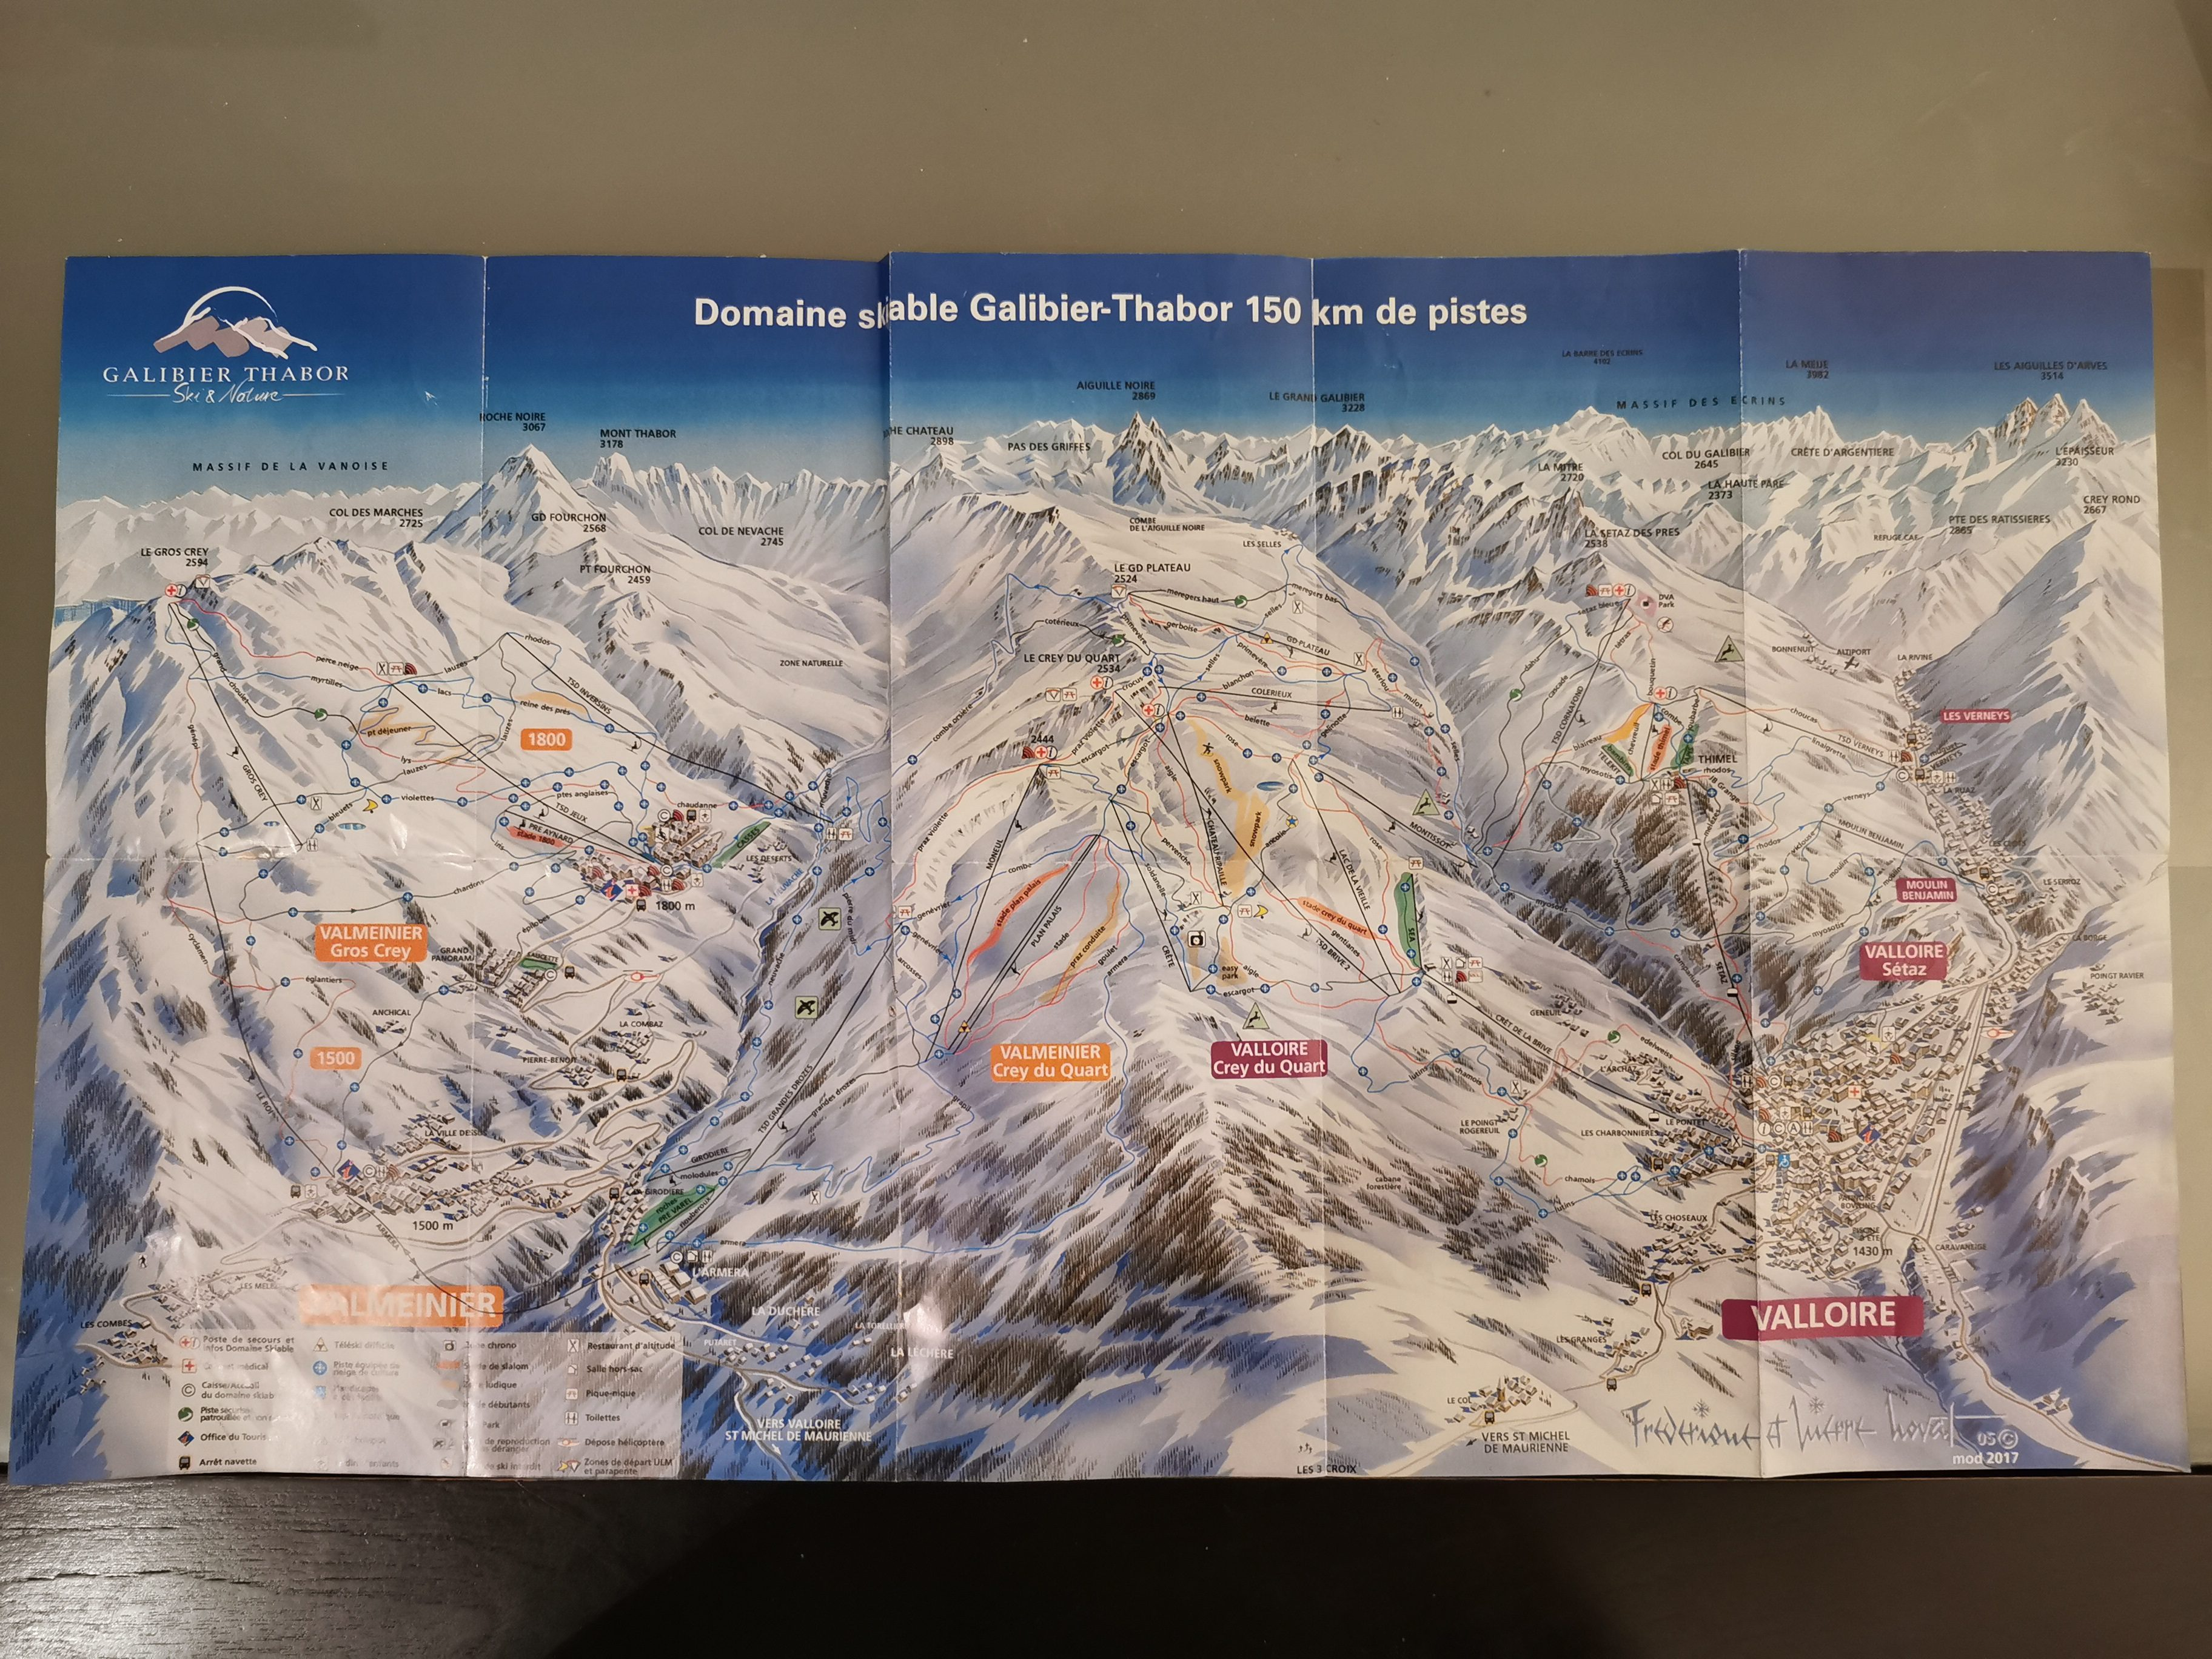 carte des pistes de ski à valmeinier voyagespia e1562029999925 - Valmeinier